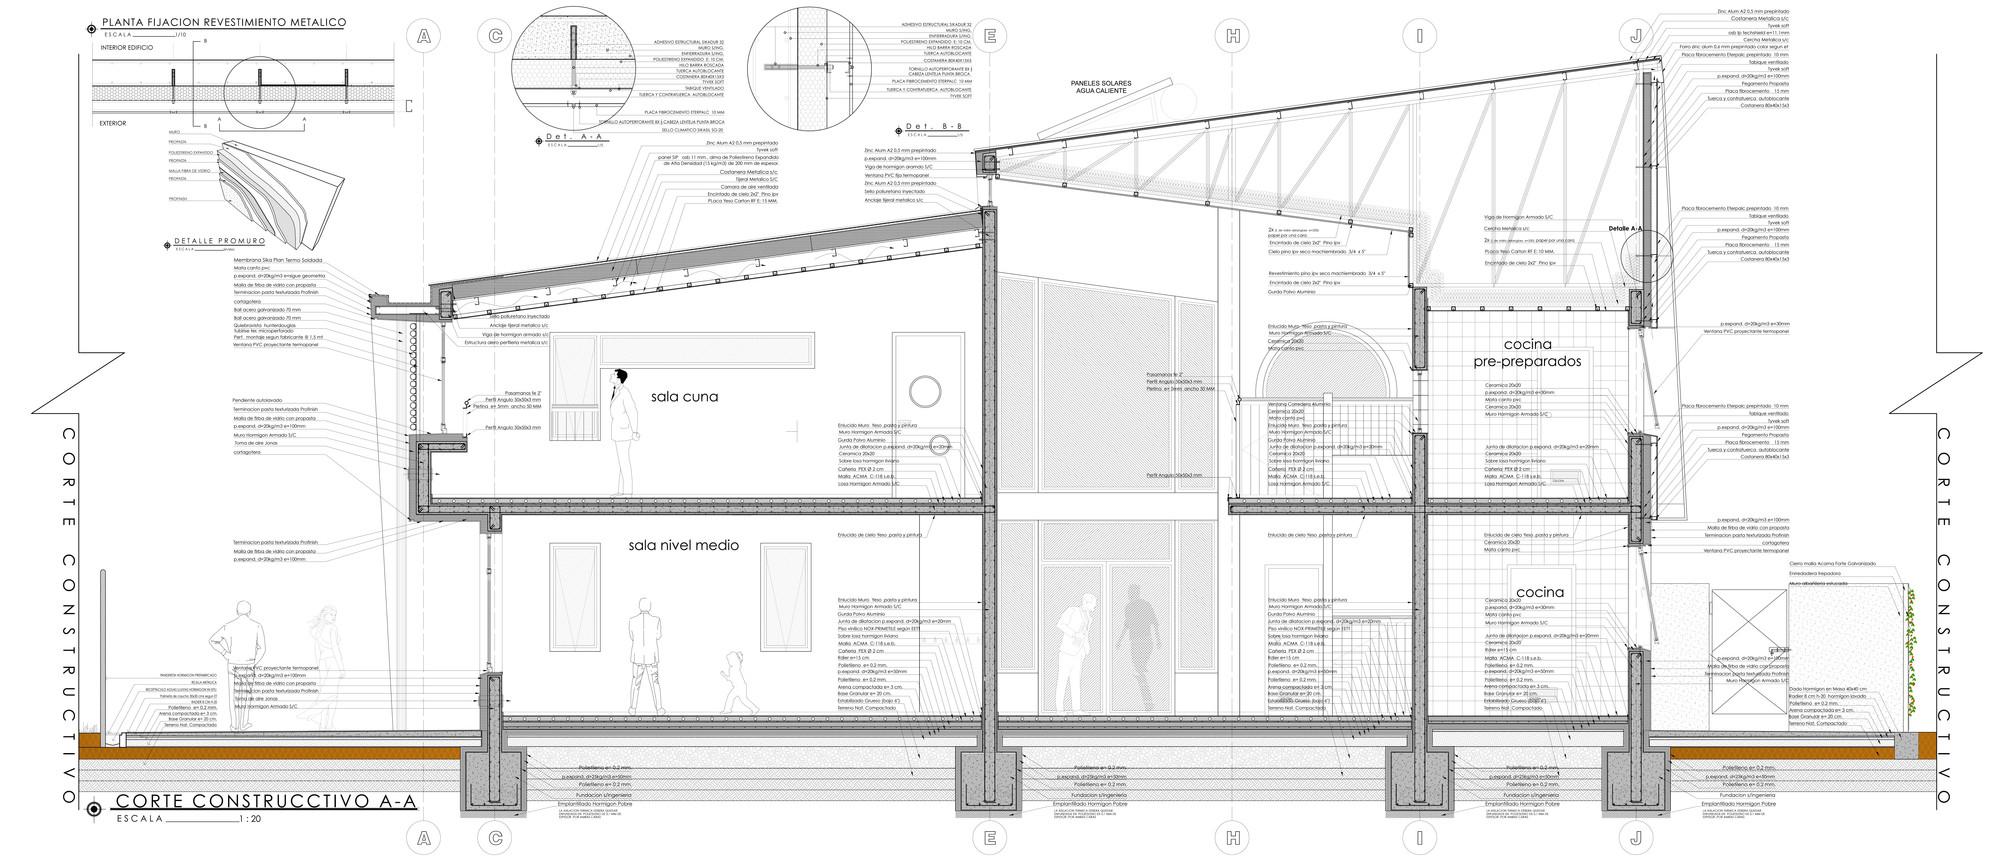 Galer a de arquitectura educacional p blica el desaf o de for Estudio de arquitectura en ingles